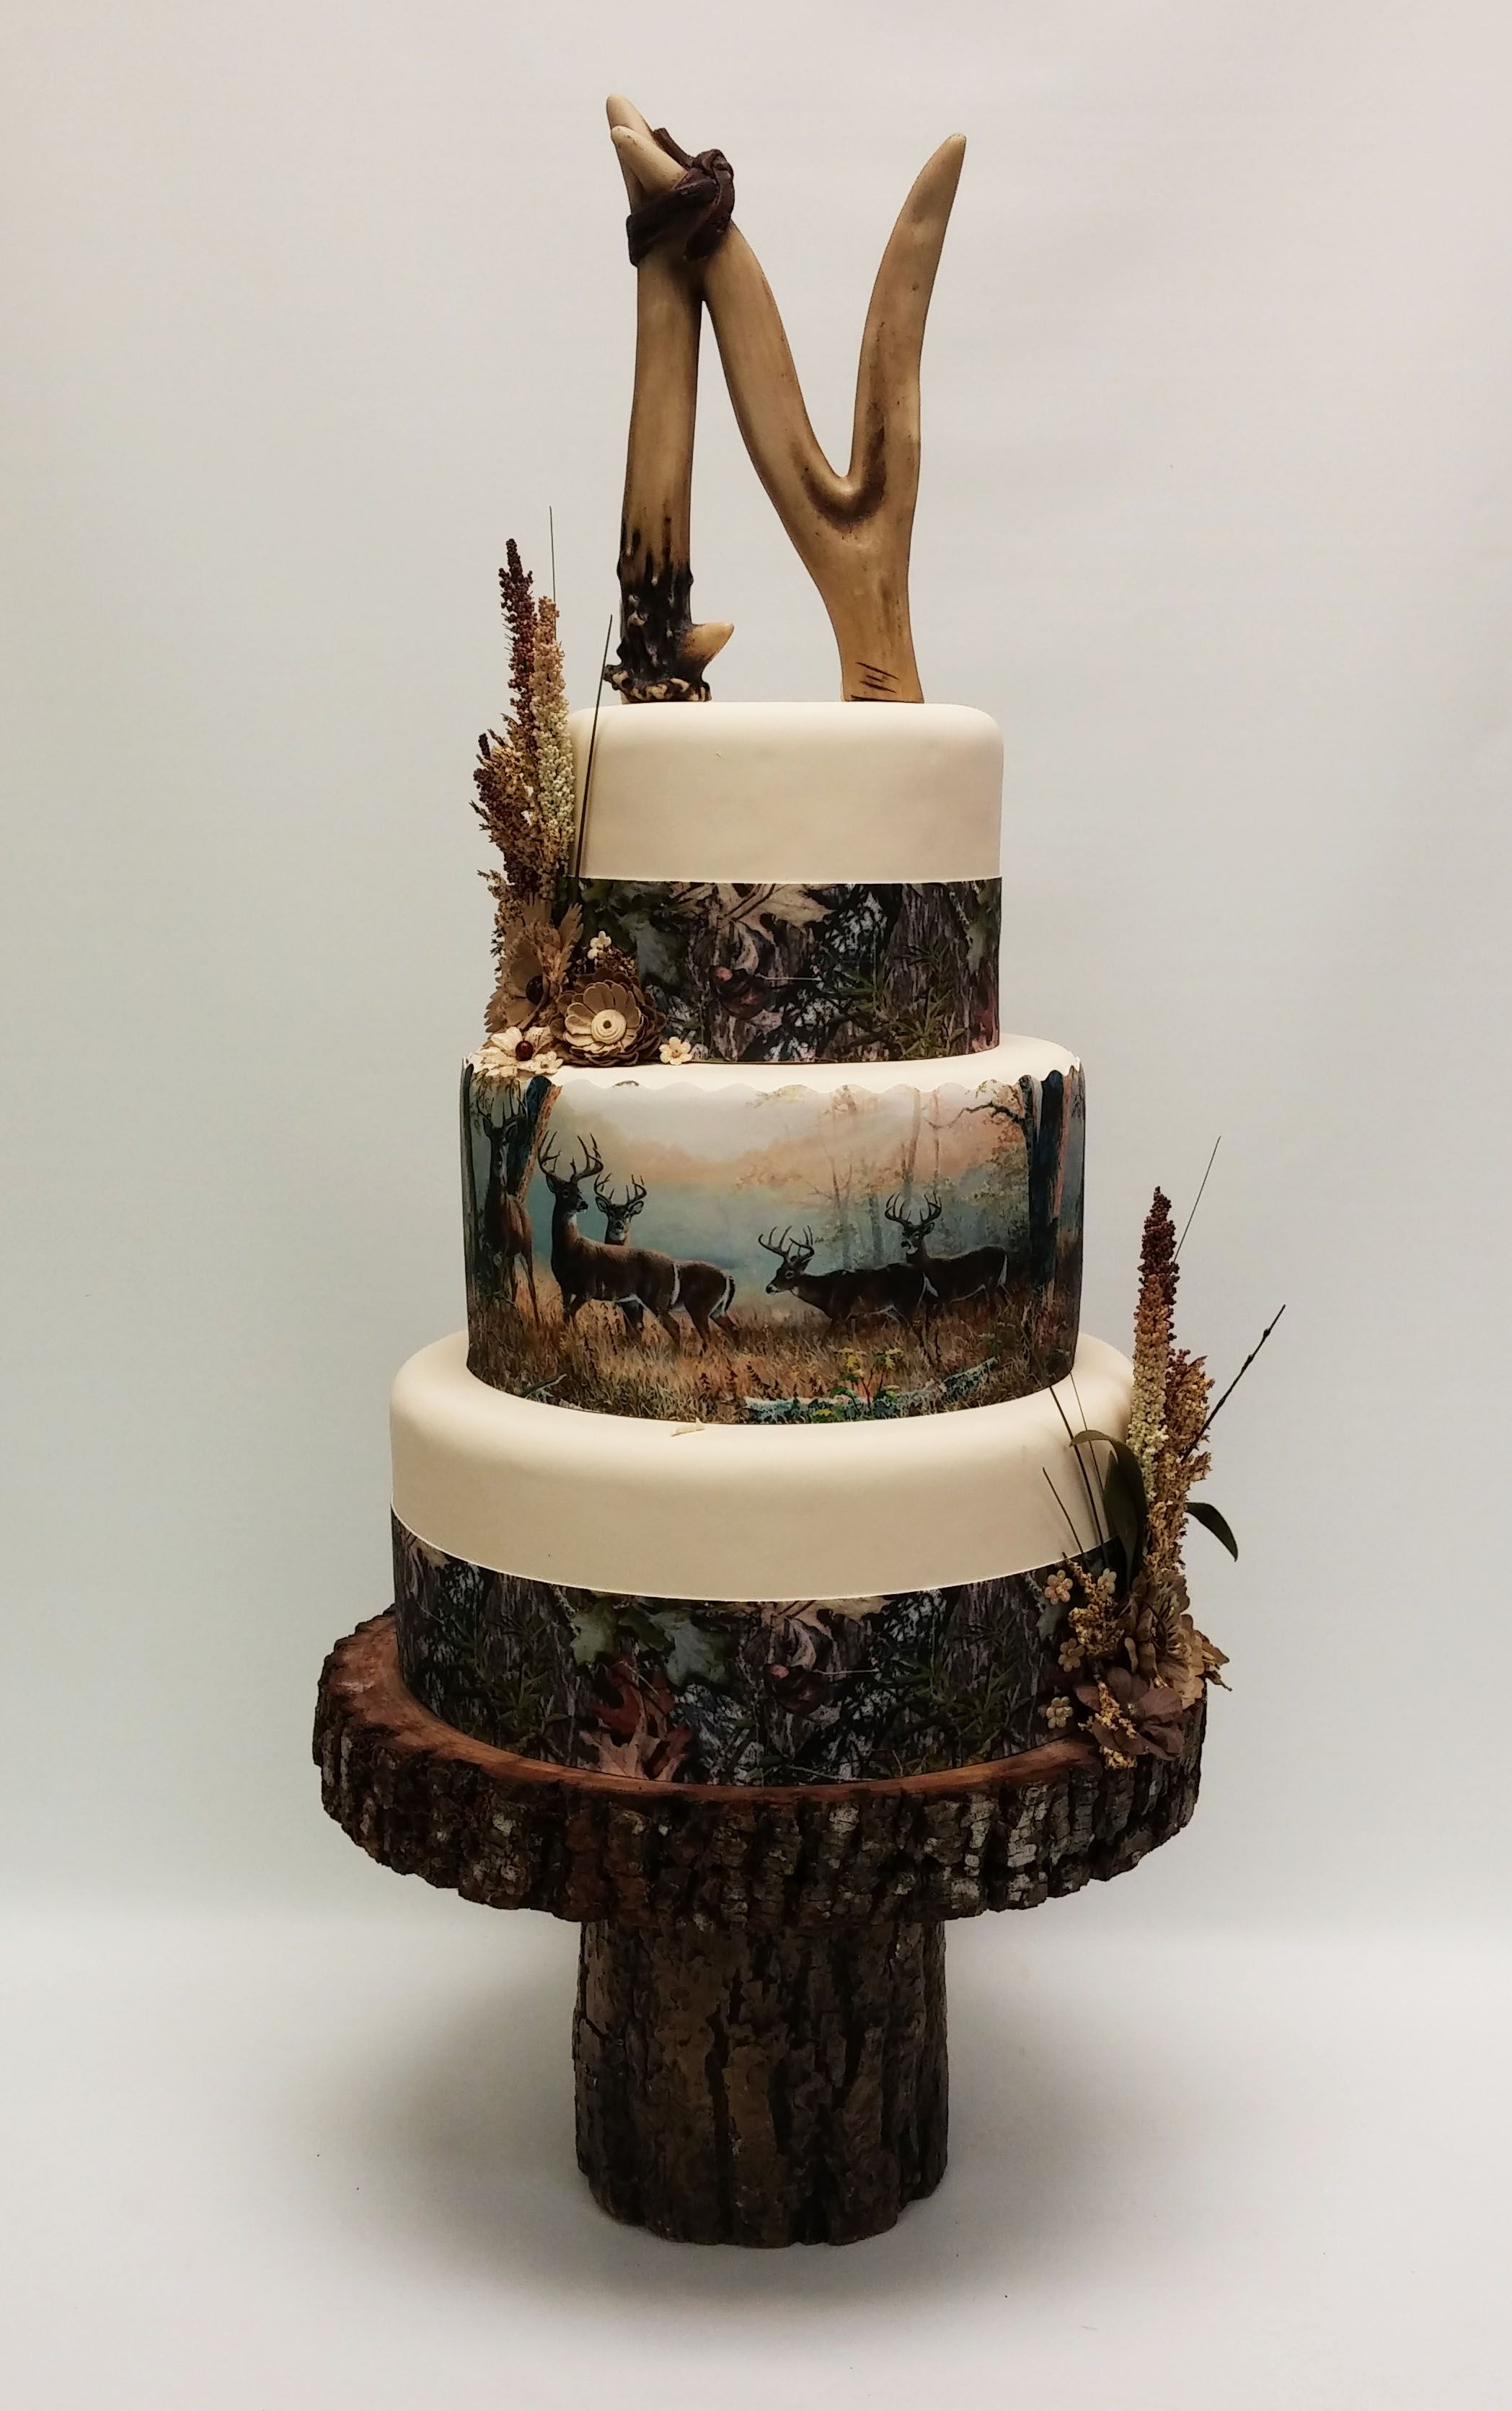 Hunting Theme Wedding Cake With A Deer Horn Monogram